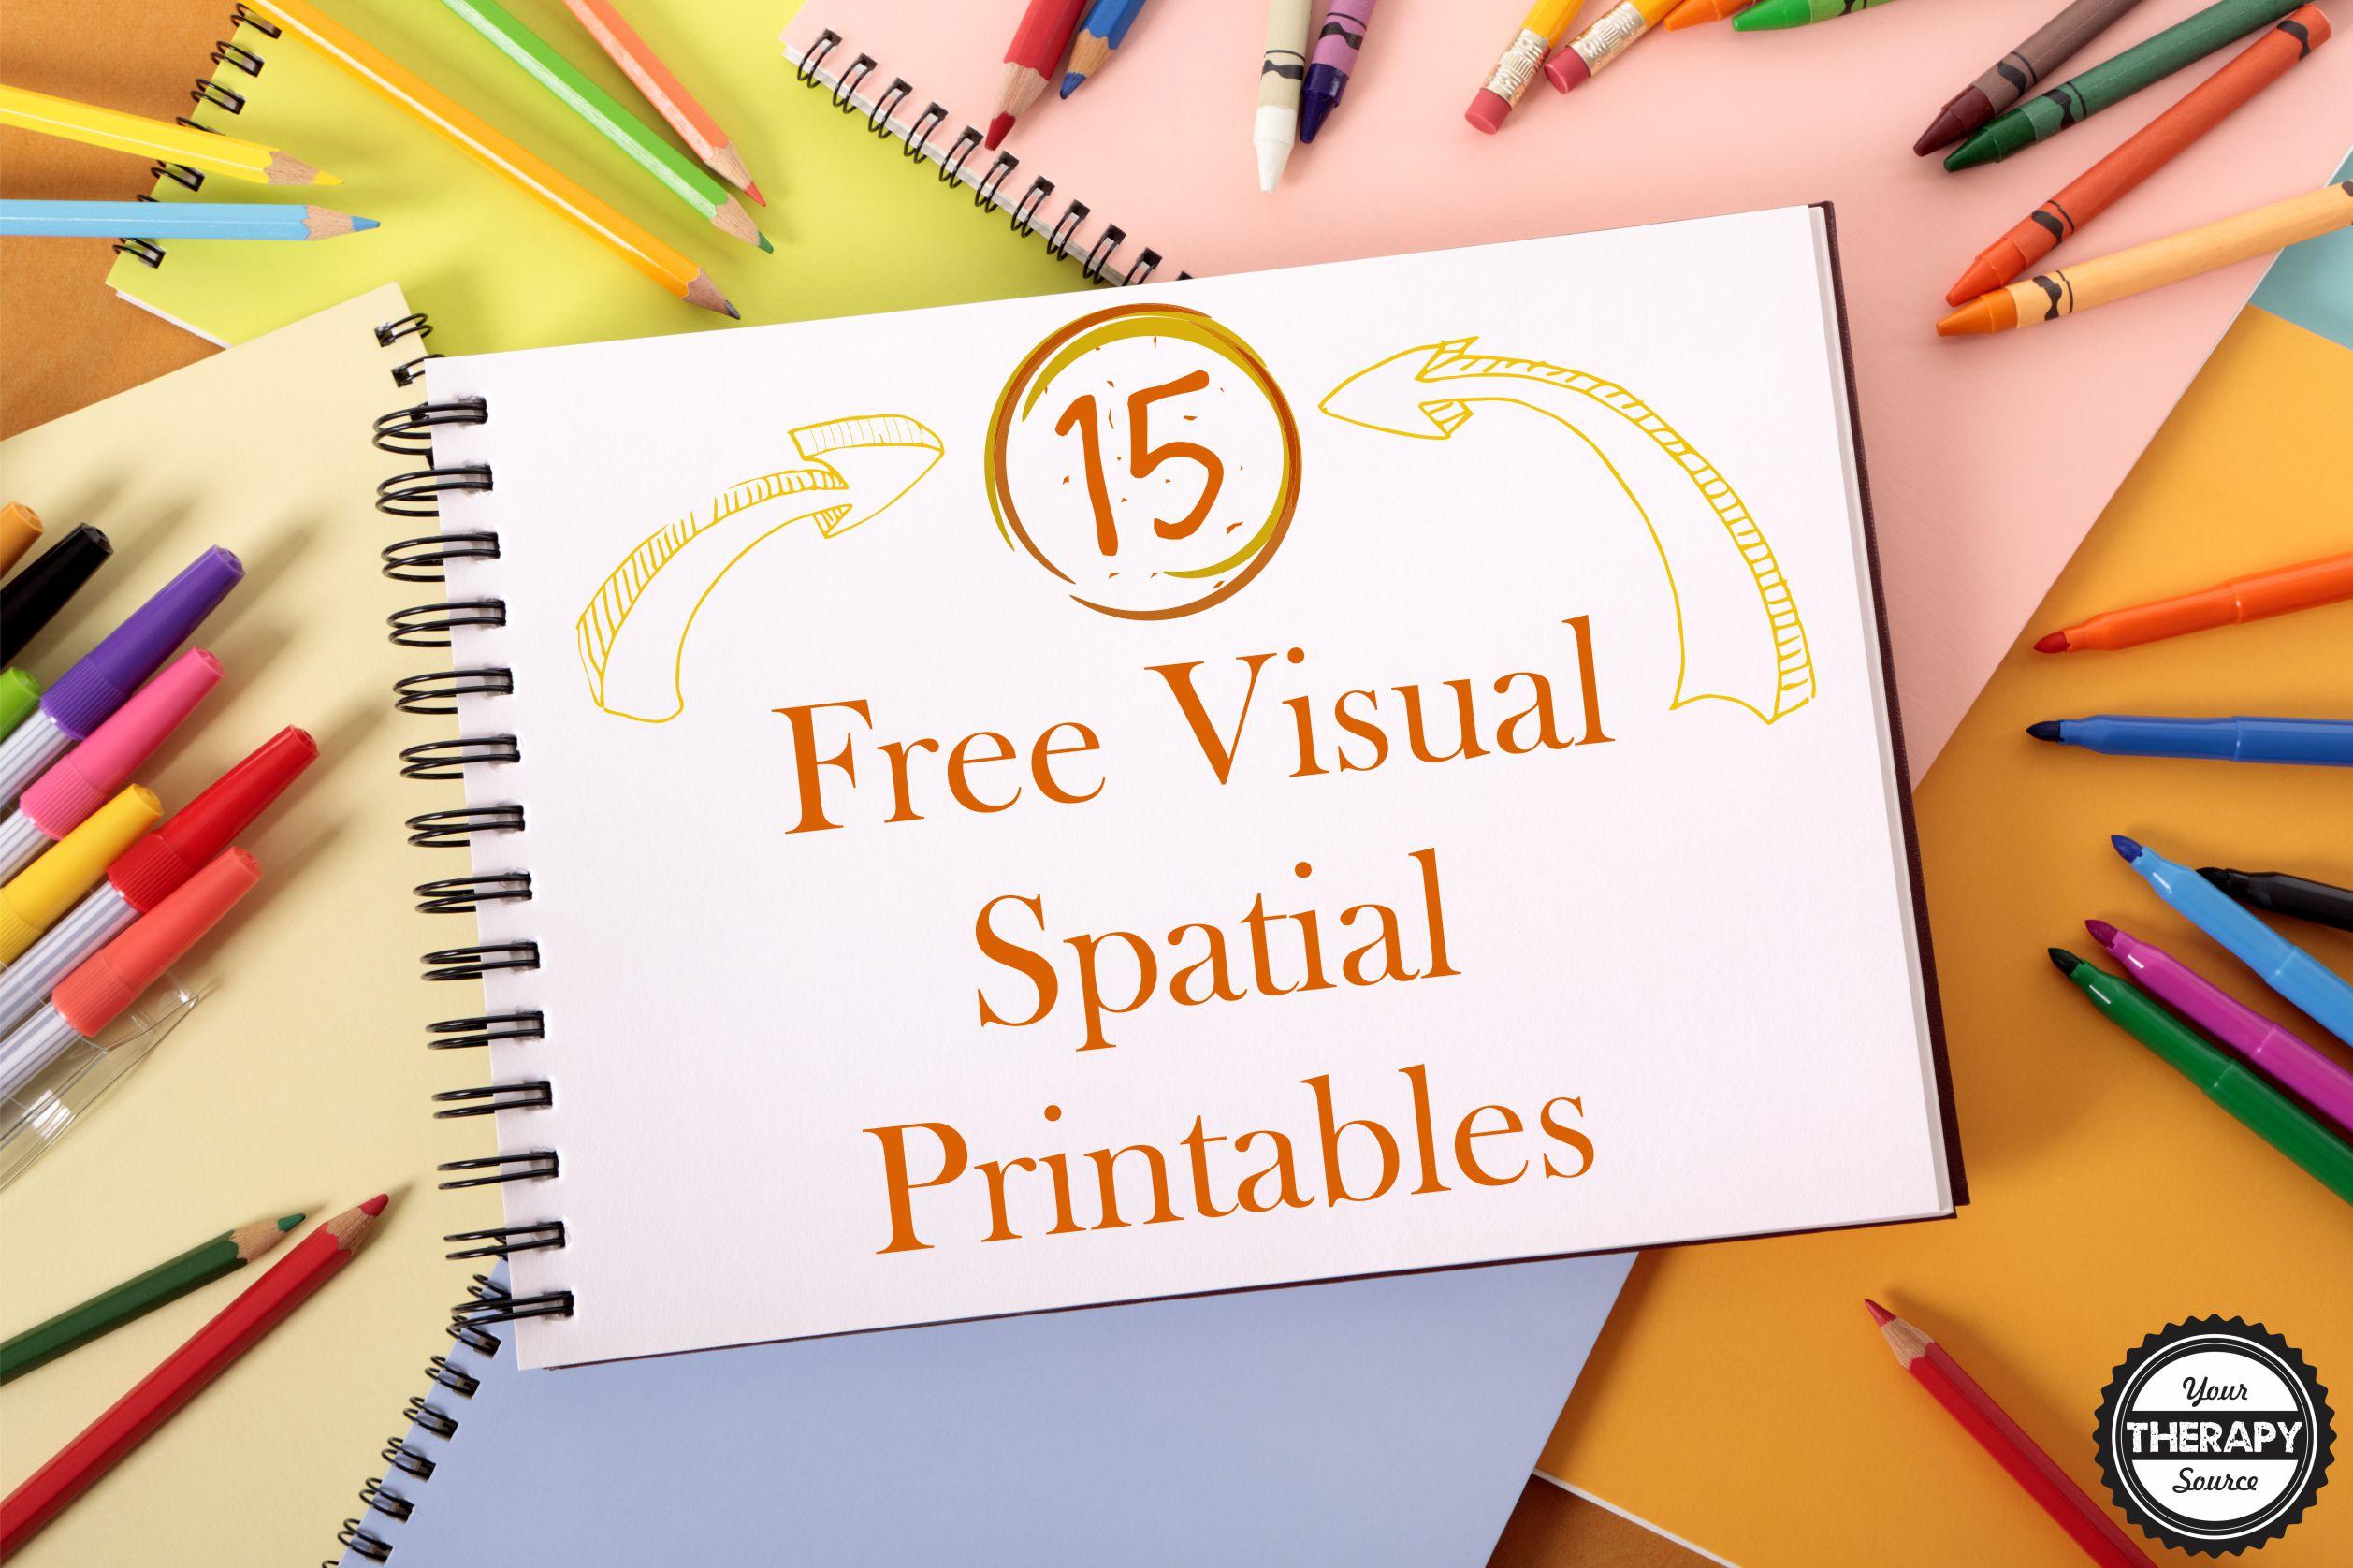 15 Free Visual Spatial Printables